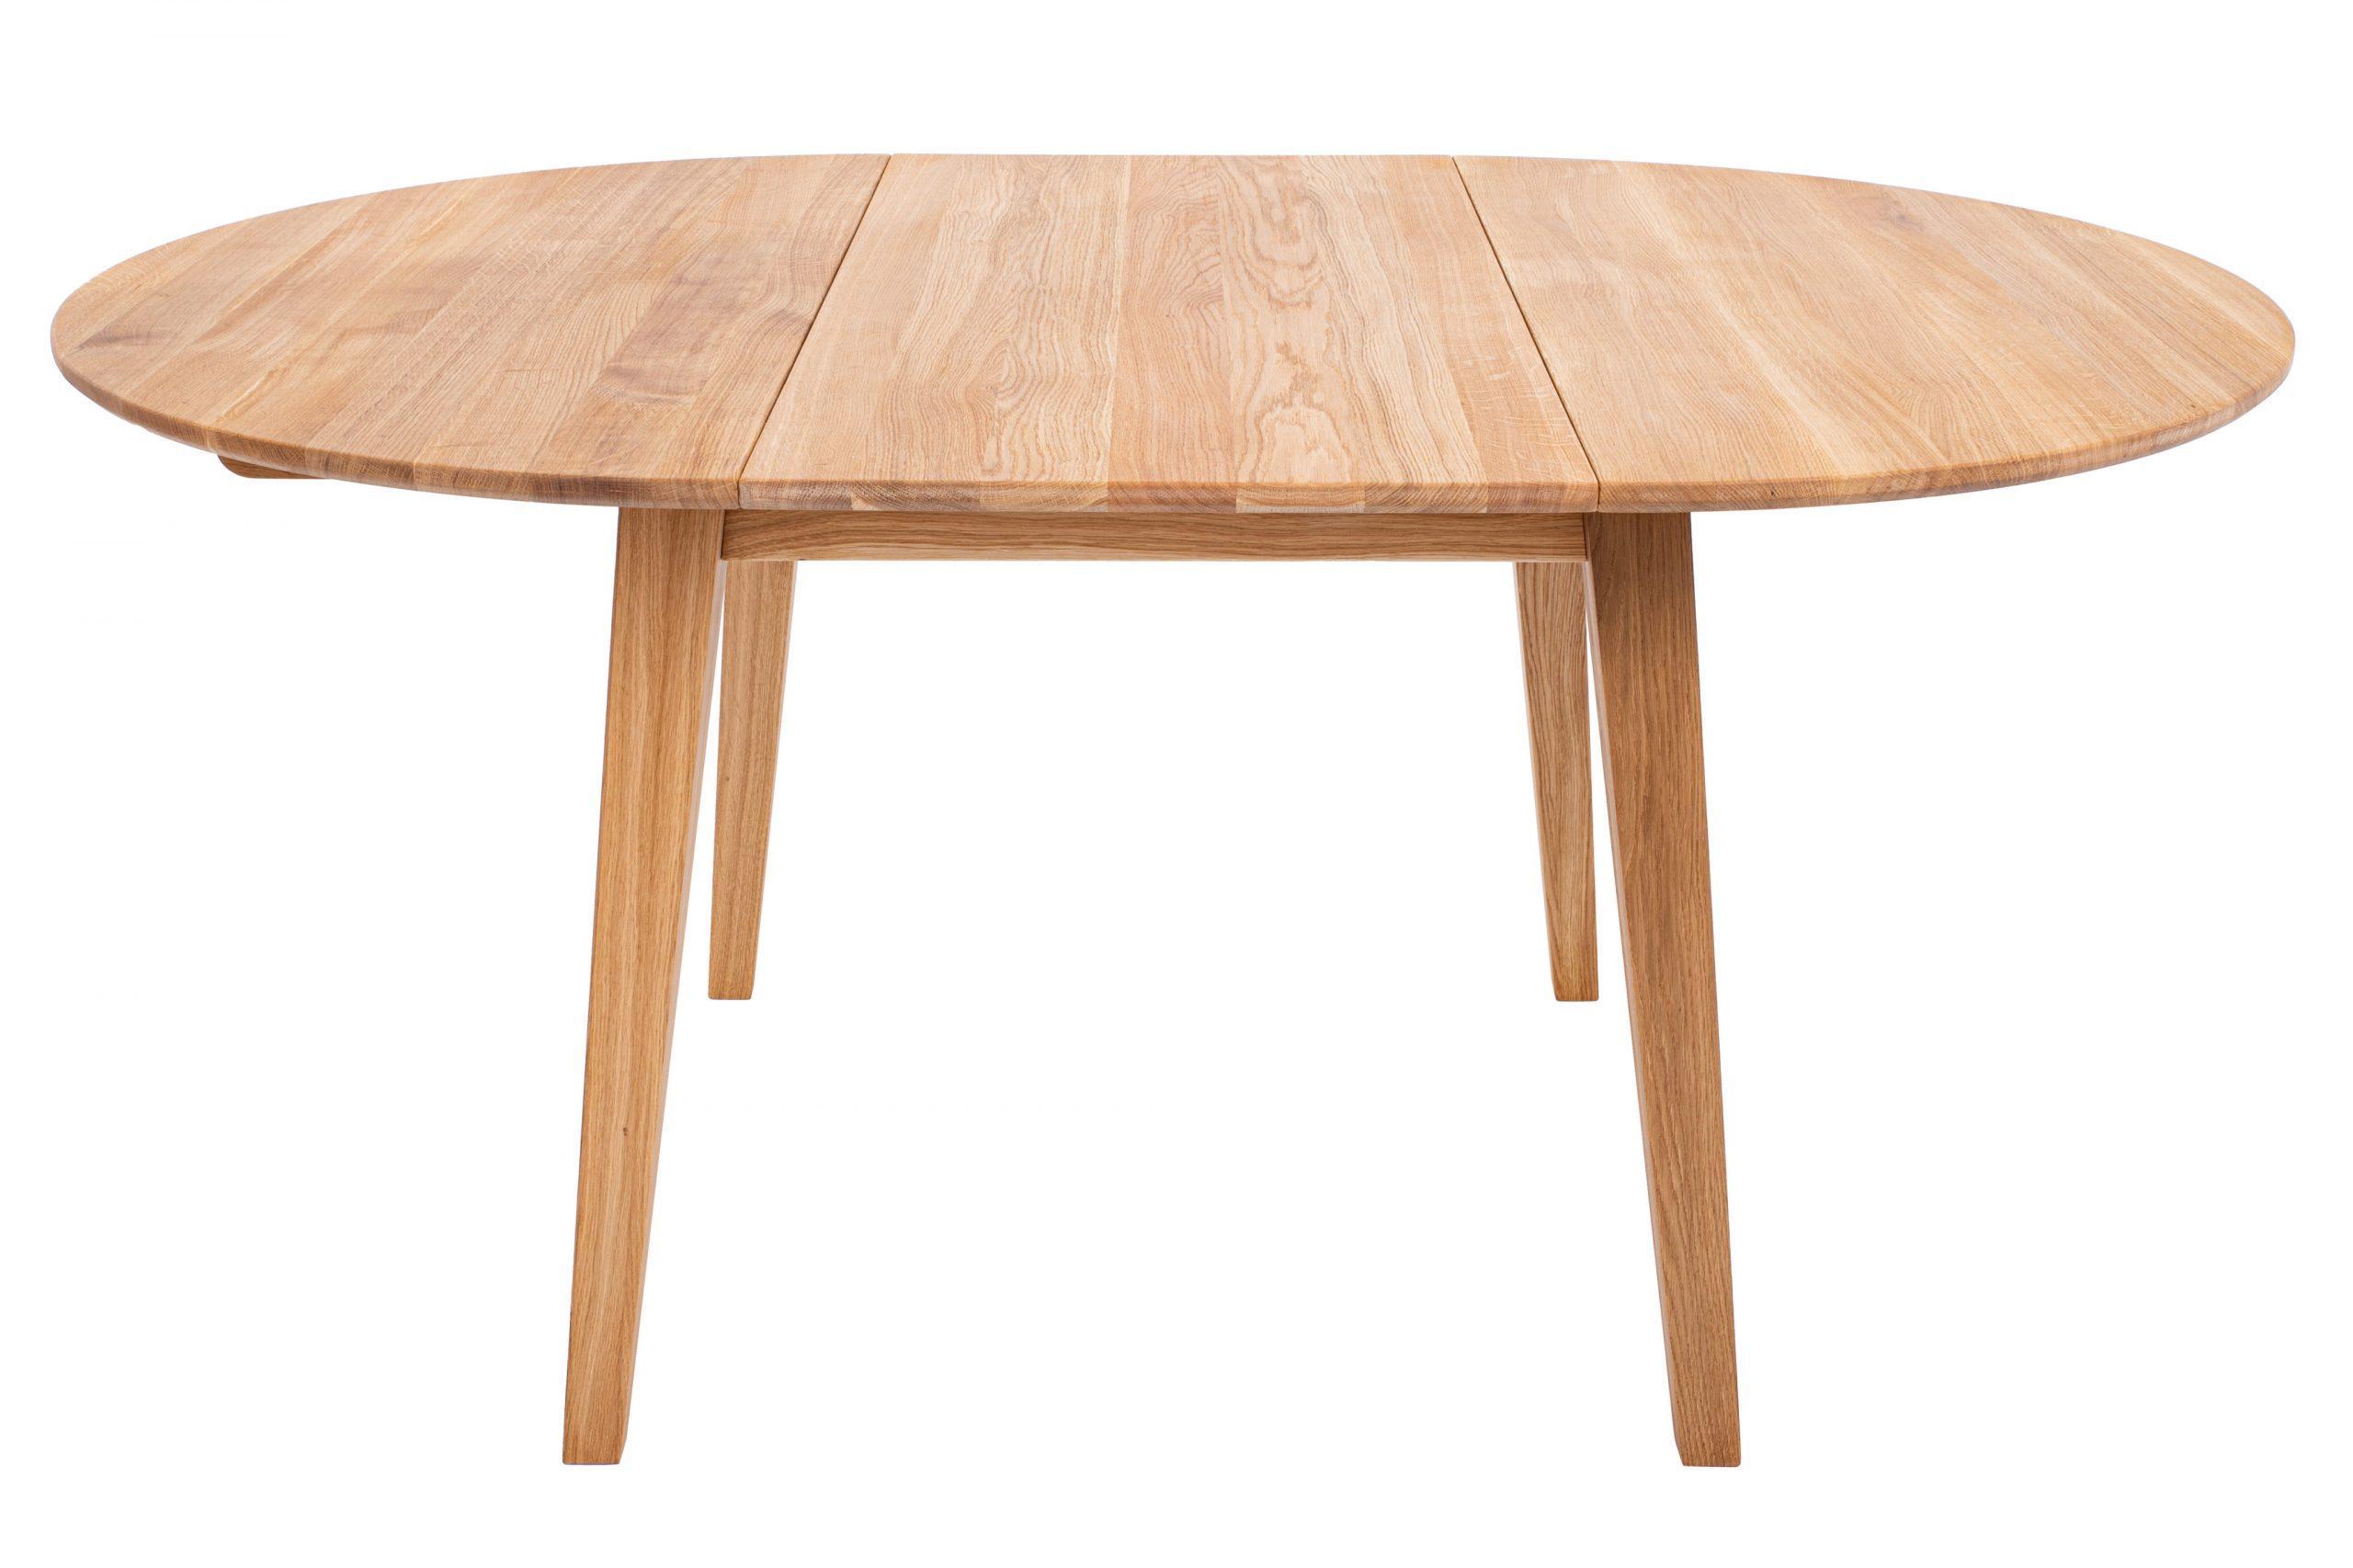 Masívny dubový olejovaný okrúhly rozkladací jedálenský stôl Genova